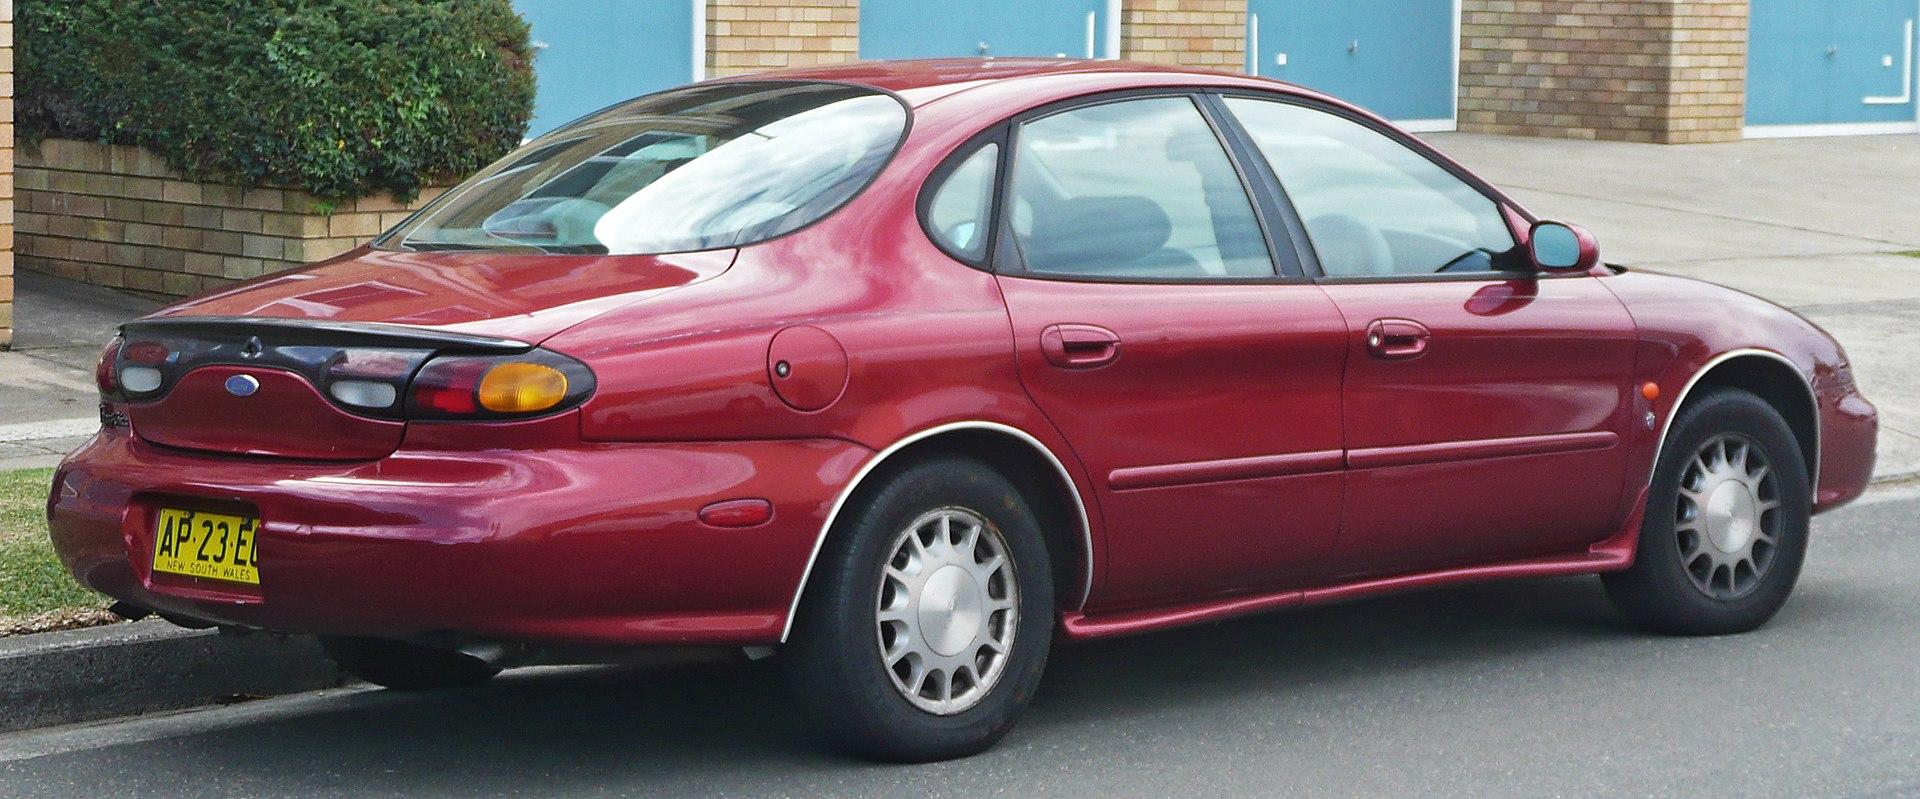 2019 - [Polestar] 2 - Page 2 1920px-1996_Ford_Taurus_%28DP%29_Ghia_sedan_%282010-06-17%29_02